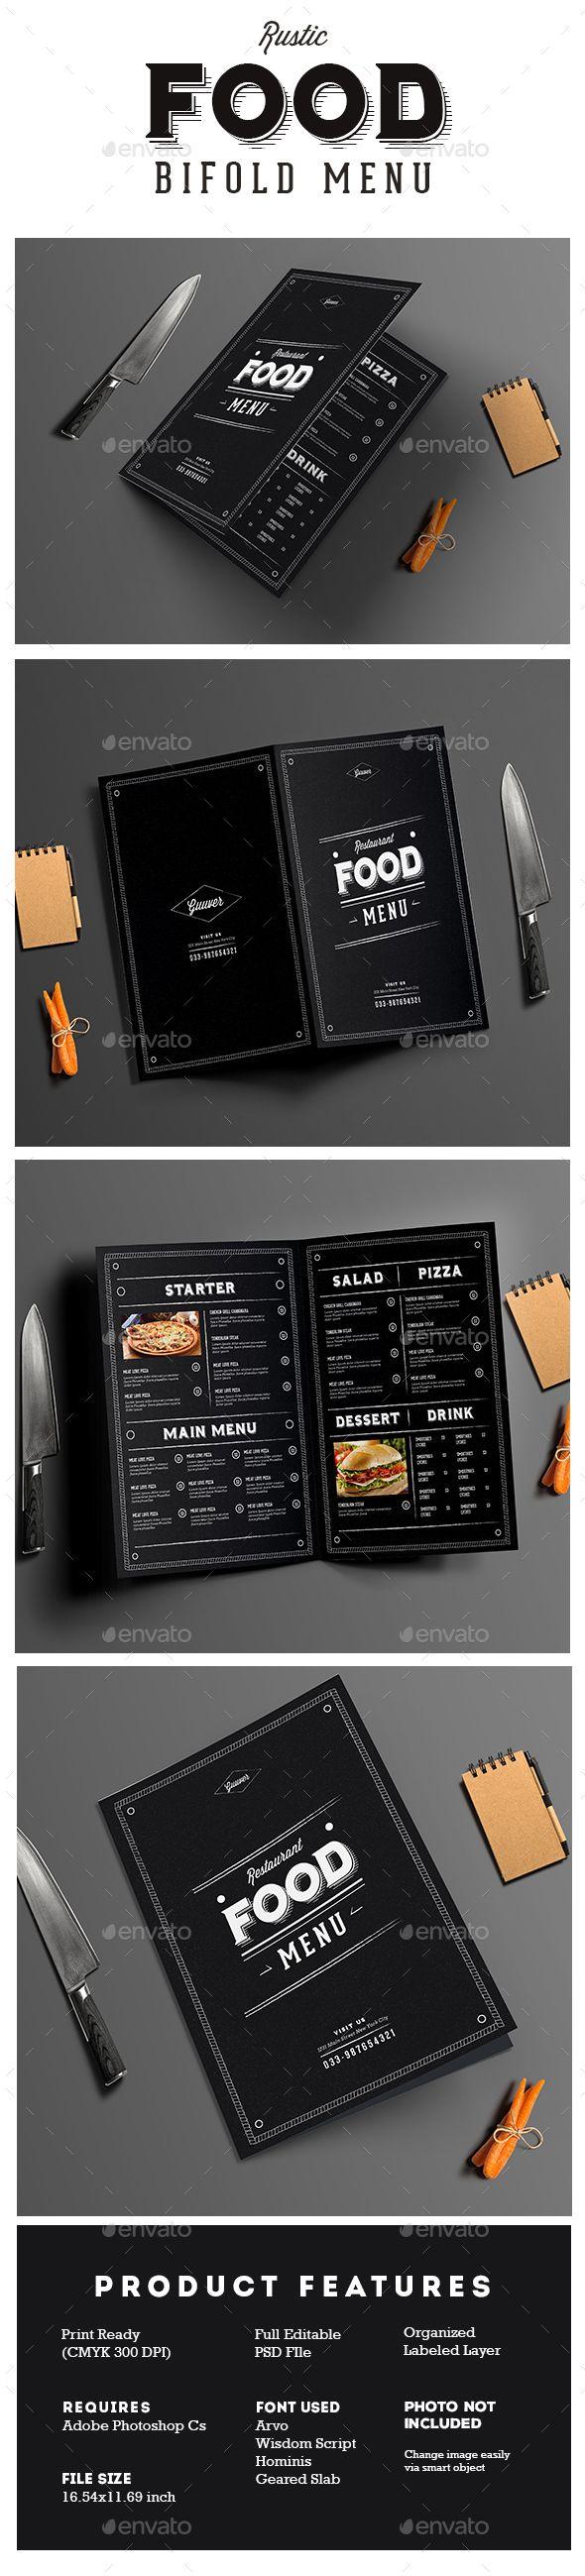 Rustic Bifold Restaurant Menu Template PSD. Download here: http://graphicriver.net/item/rustic-bifold-restaurant-menu/16337900?ref=ksioks